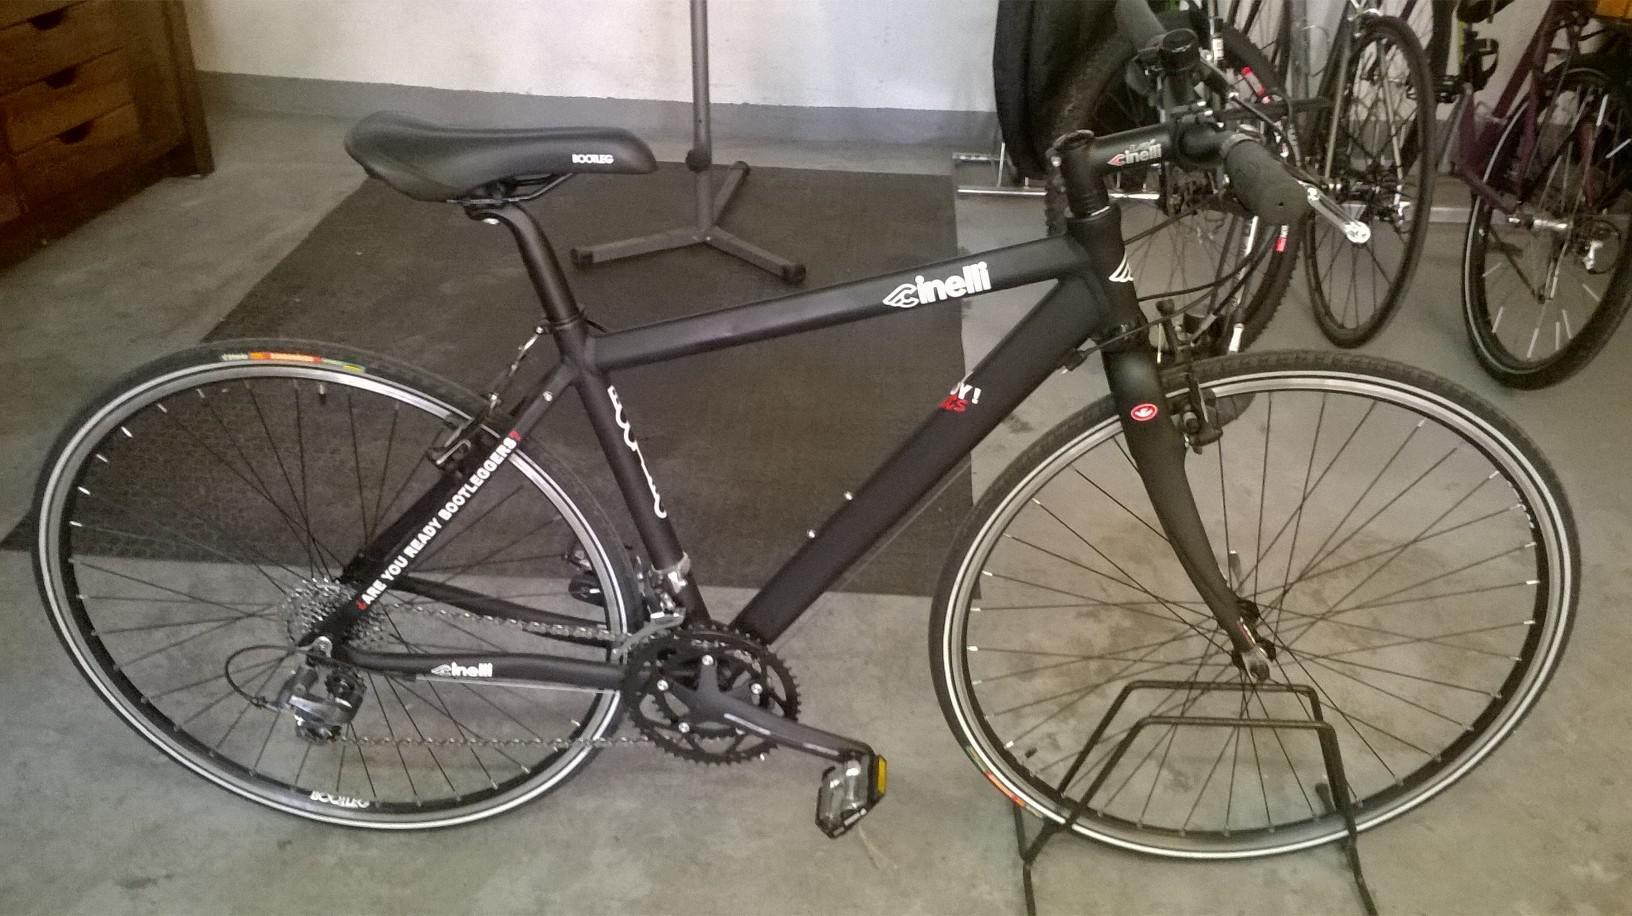 venduto cinelli bootleg hoy hoy rats taglia bici complete telai forcelle fixedforumit